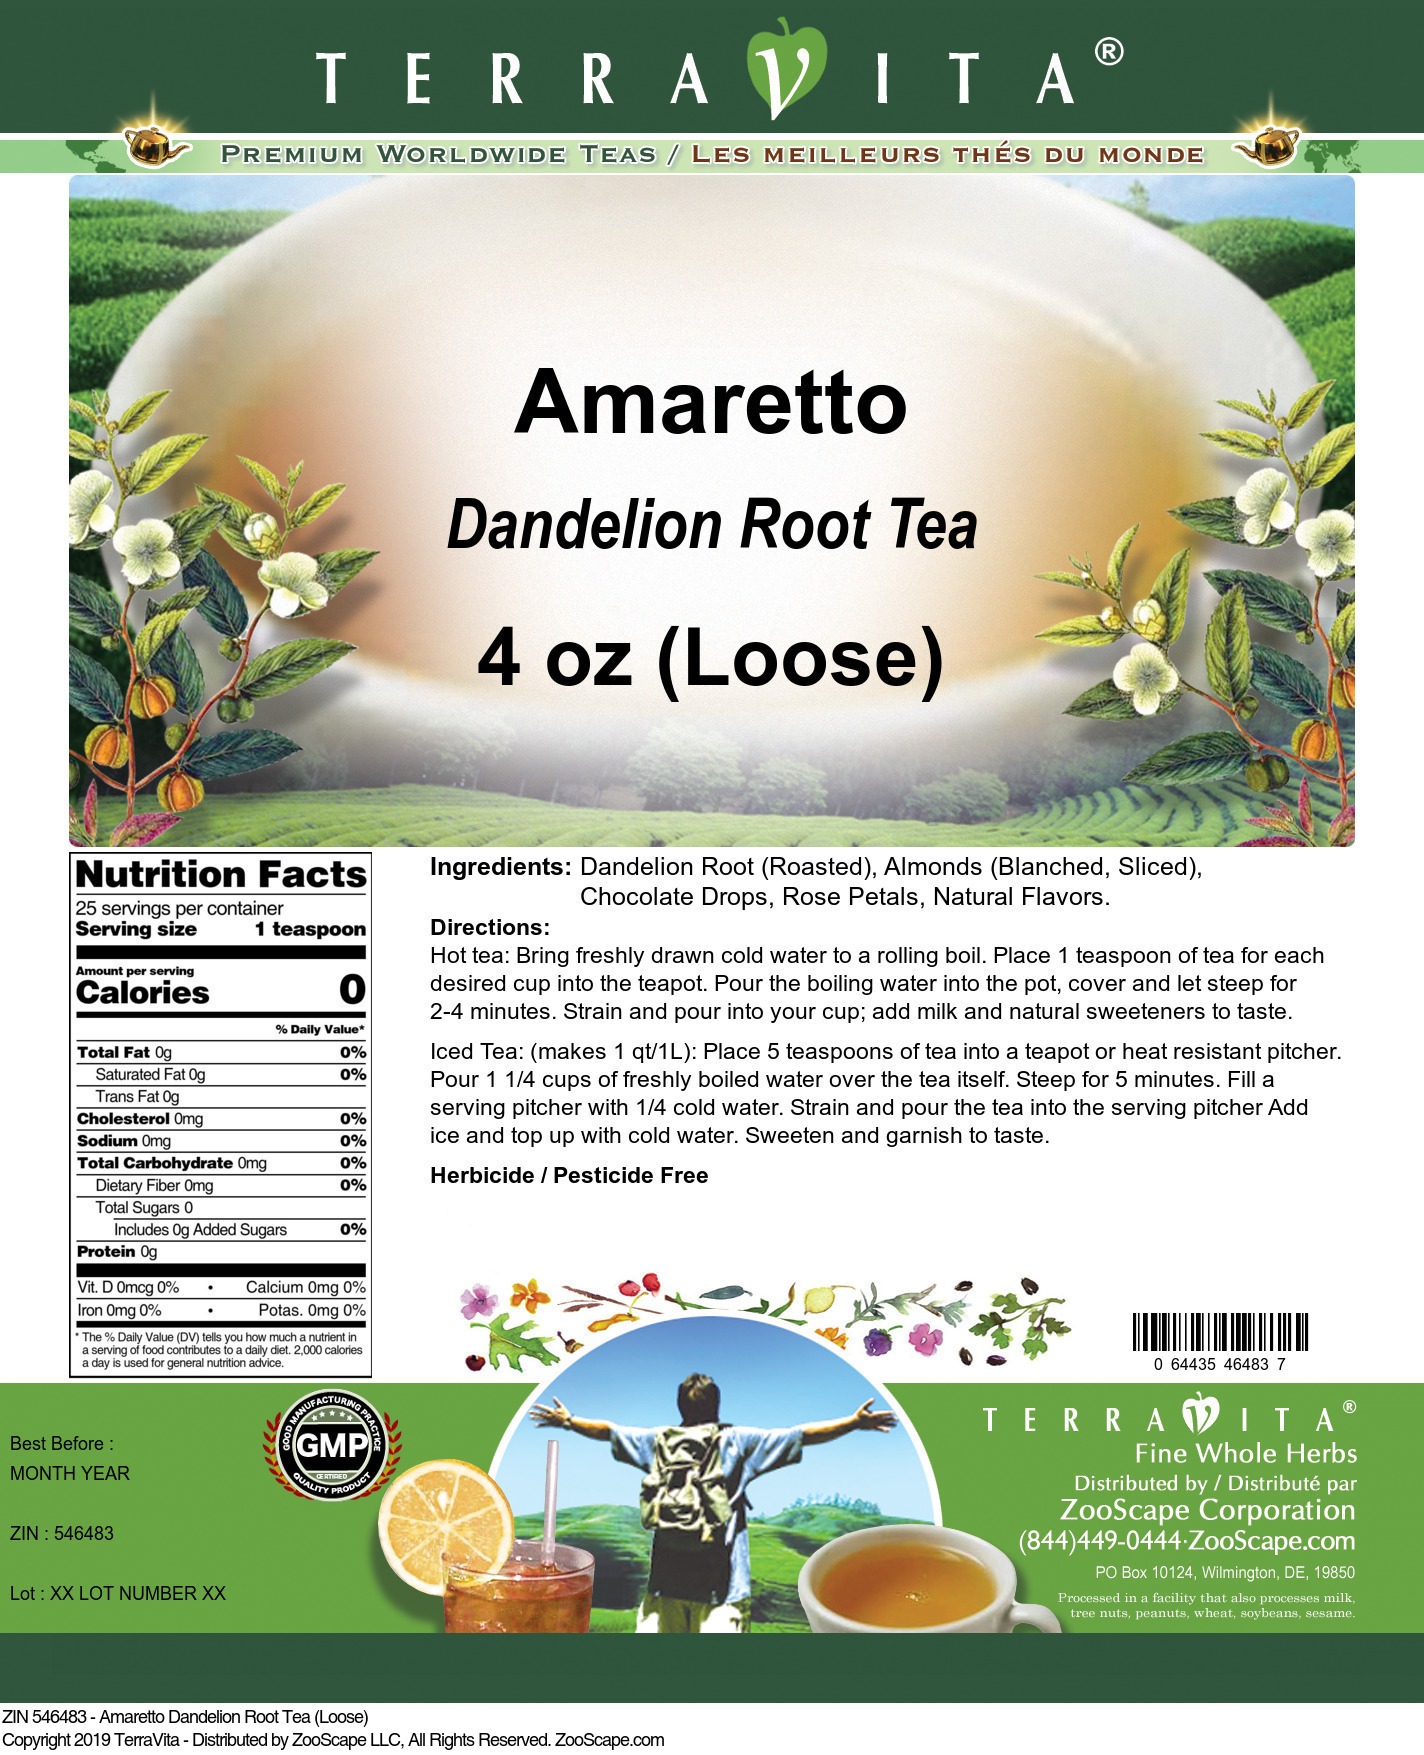 Amaretto Dandelion Root